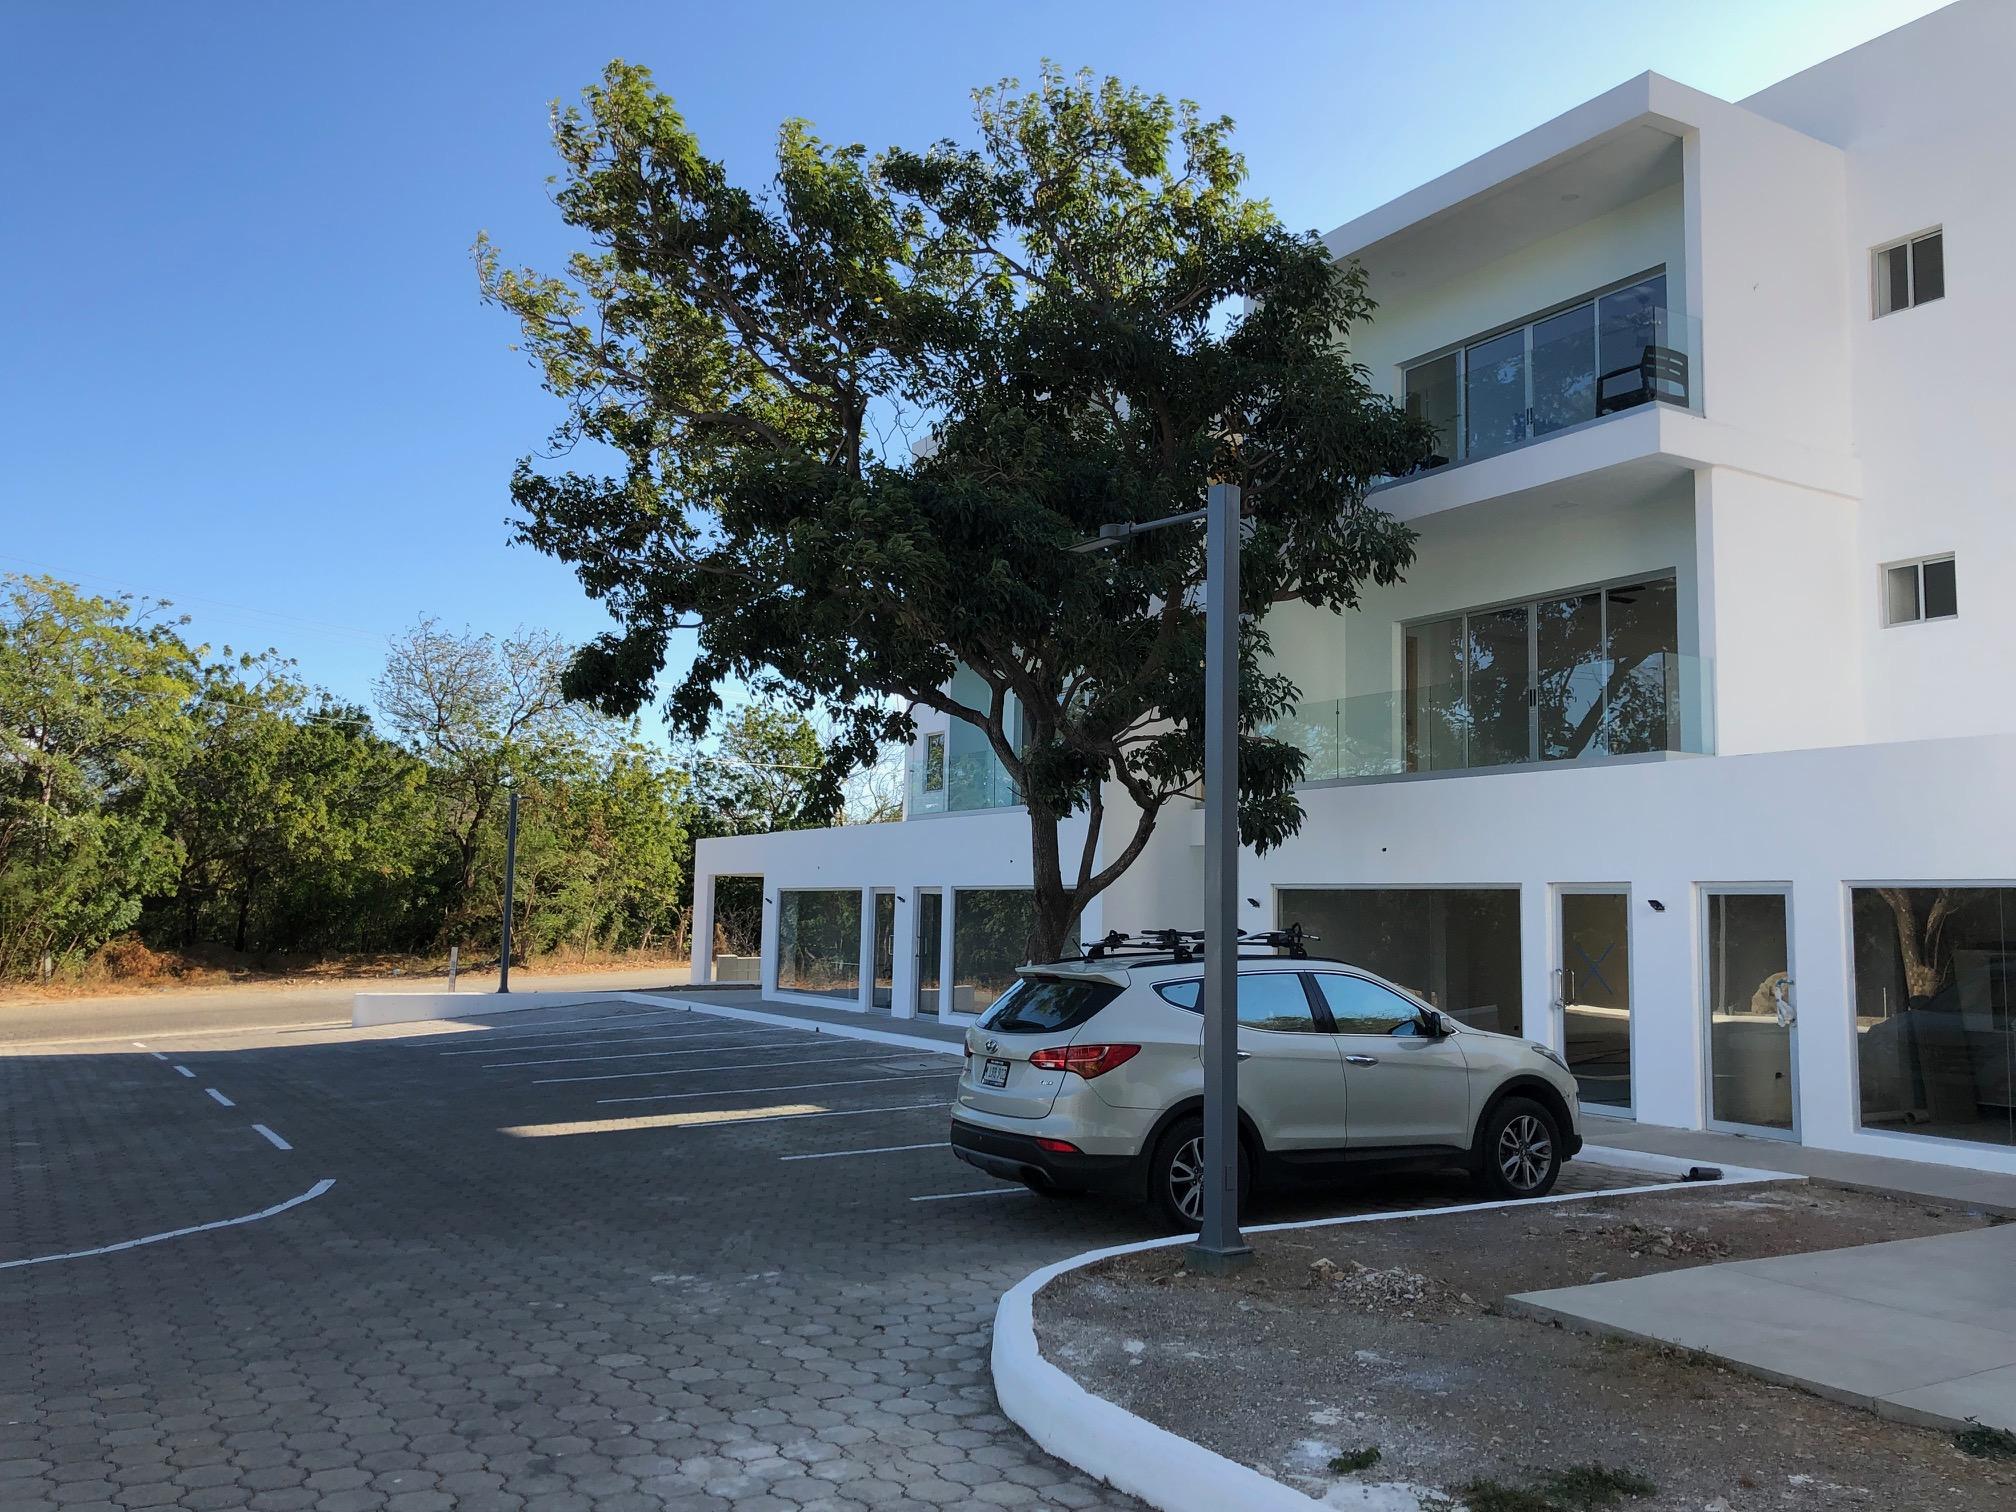 Real Estate For Nicaragua 16.jpg